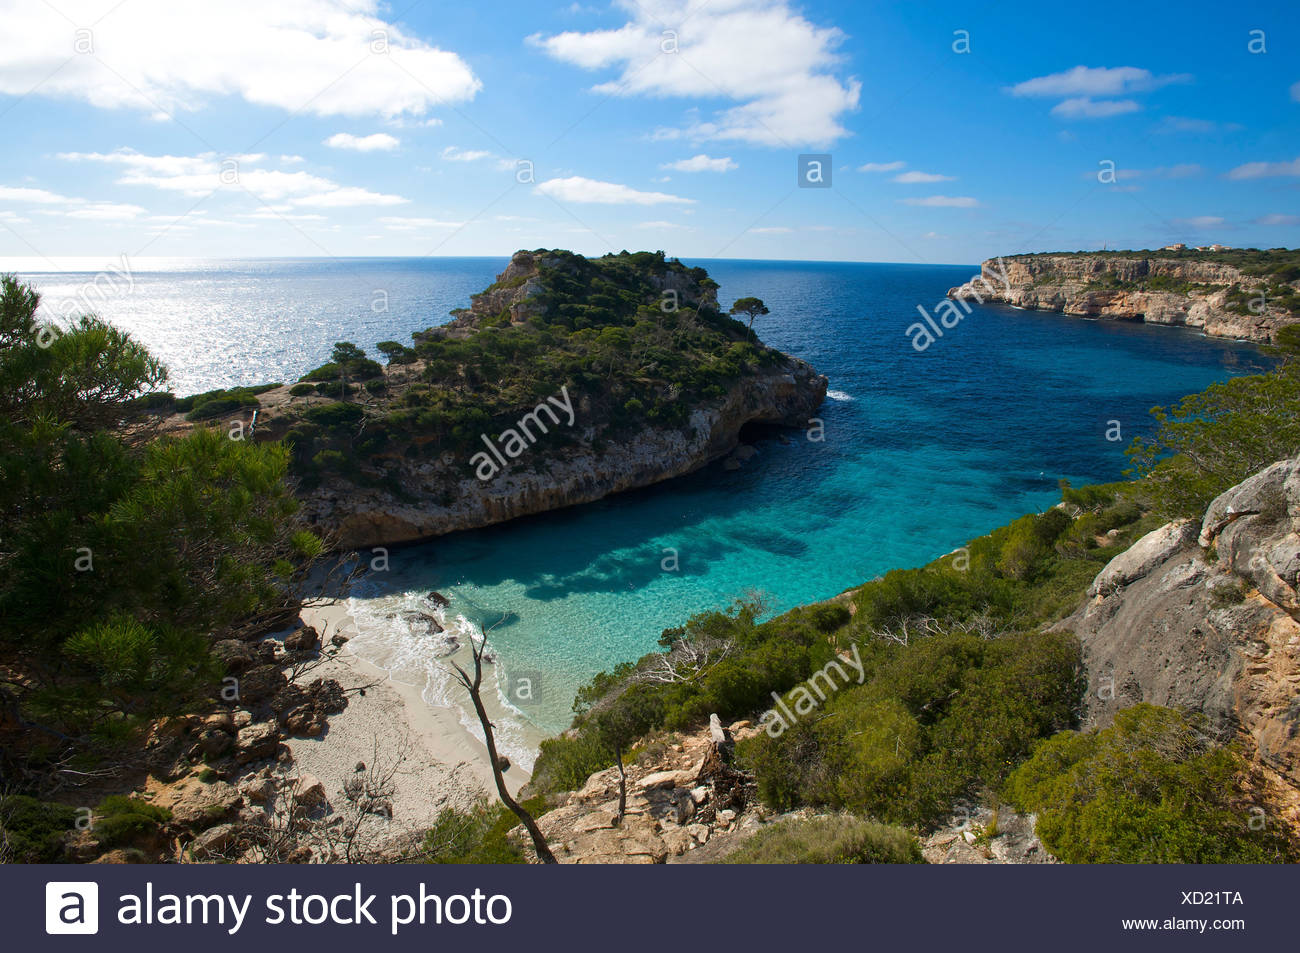 Cala S'Amonia, Majorca, Balearic Islands, Spain, Europe - Stock Image